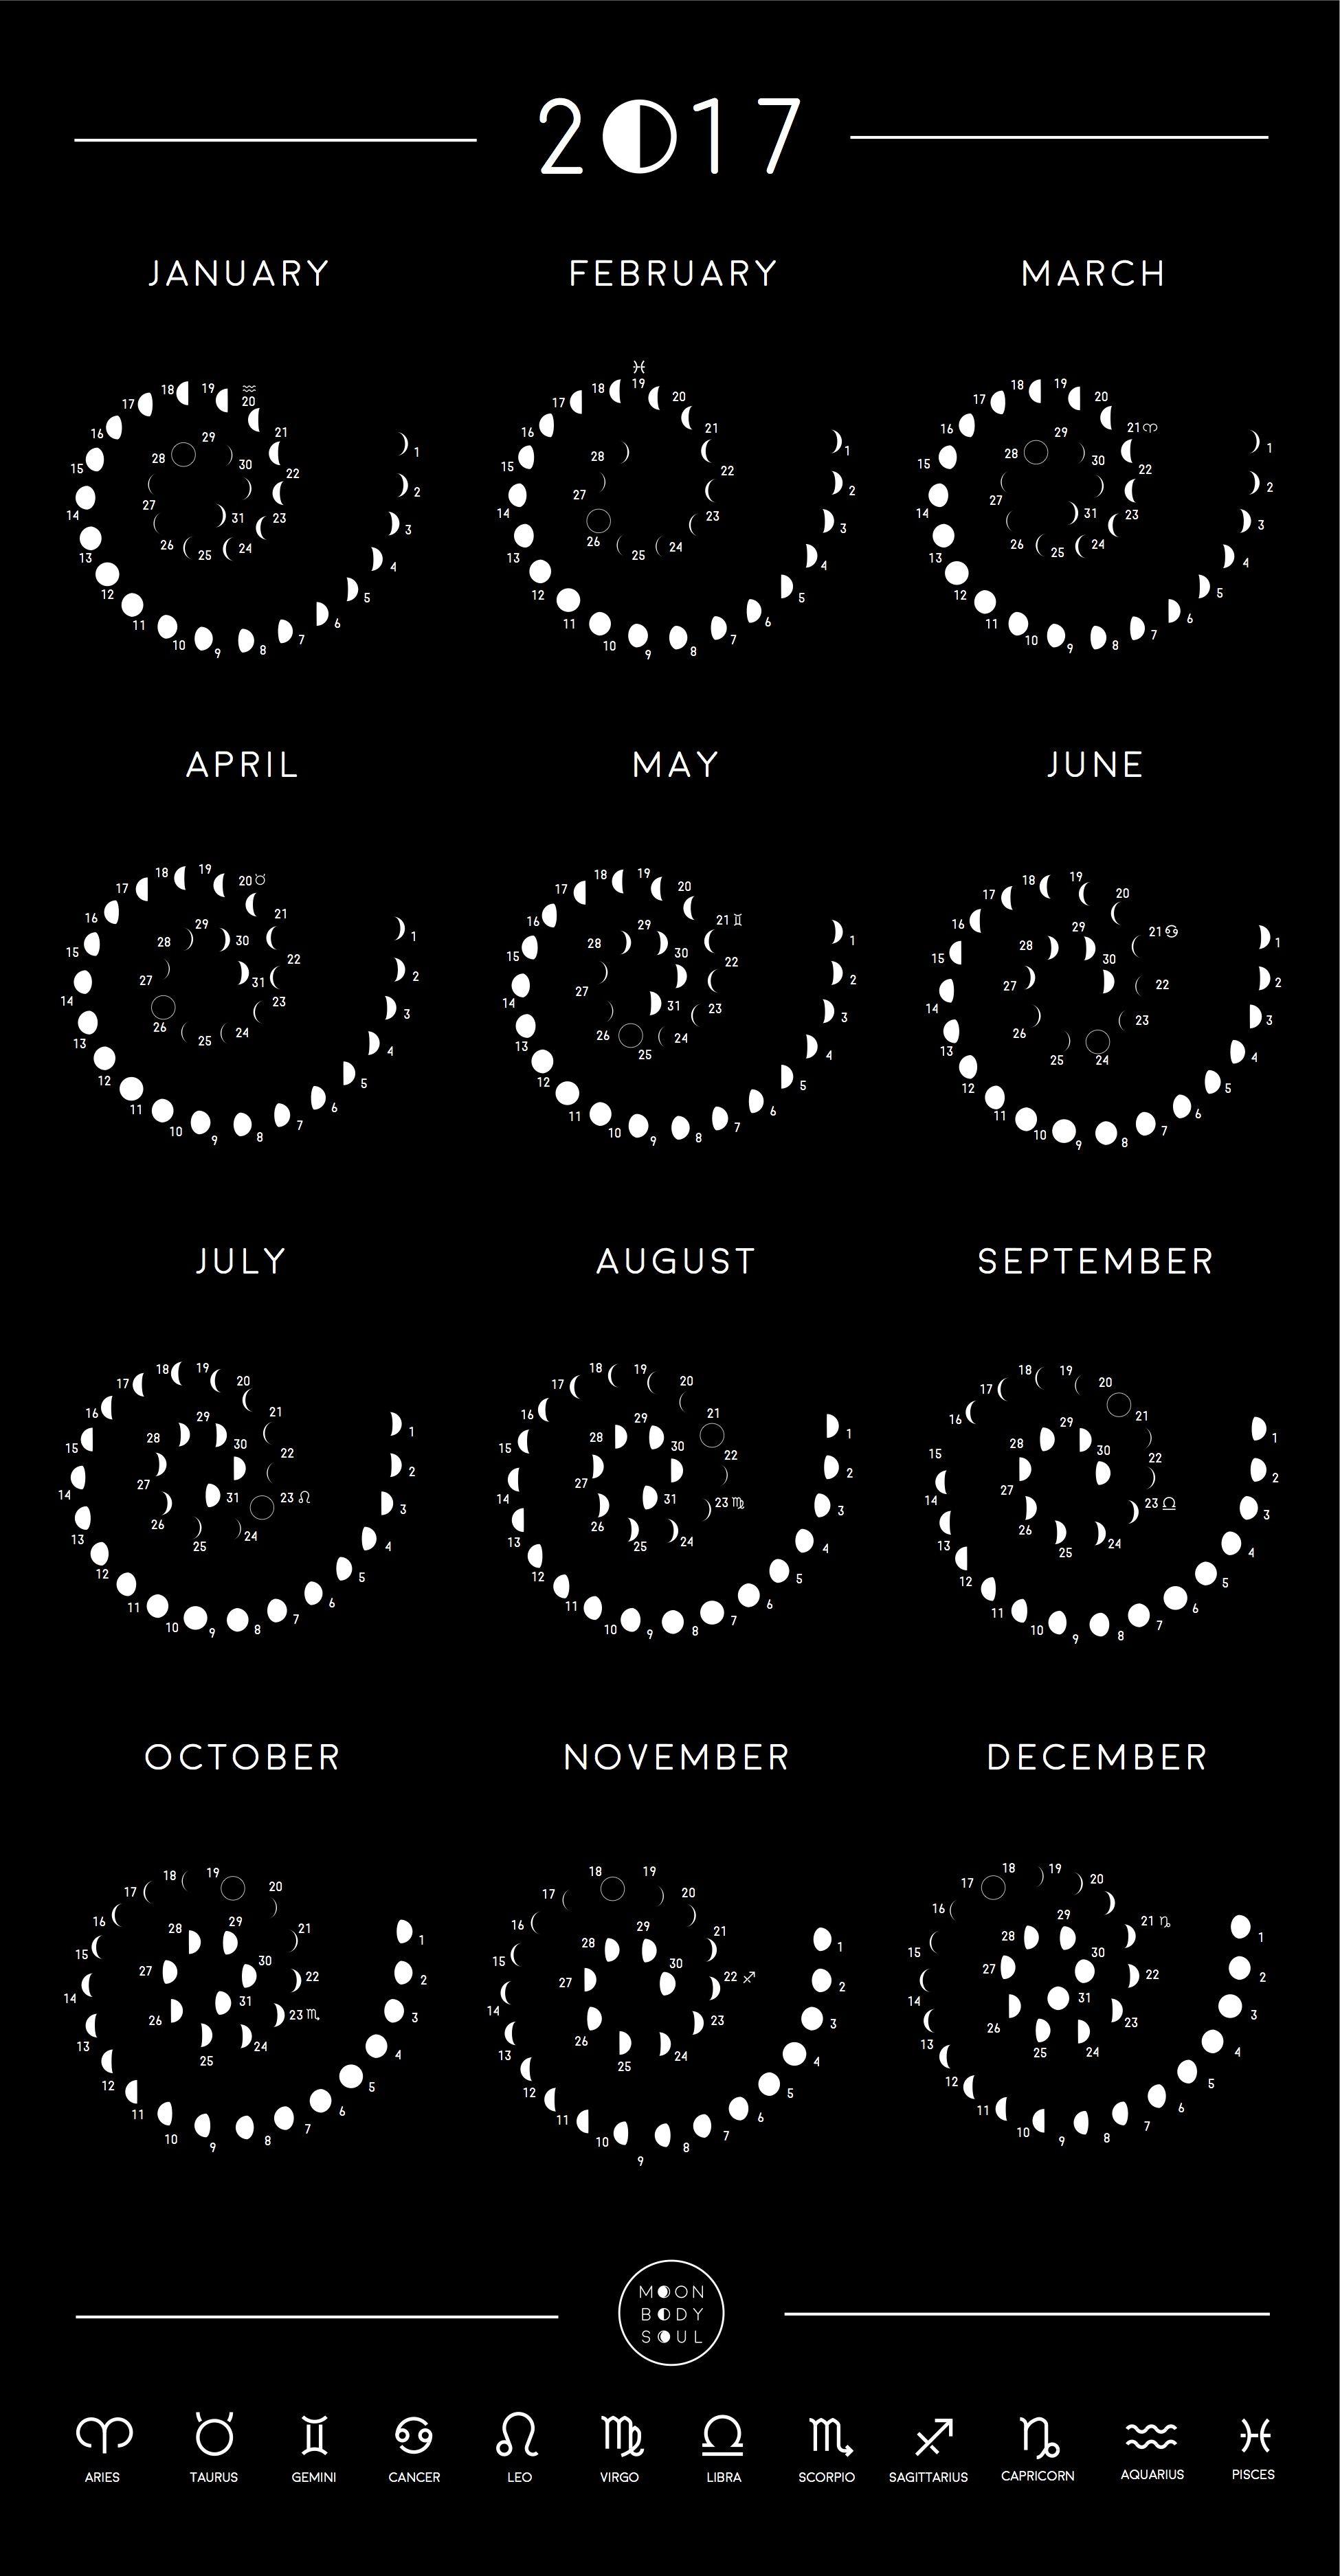 2019 Moon Phase Calendar | Moon Phase Calendar, Moon Phases